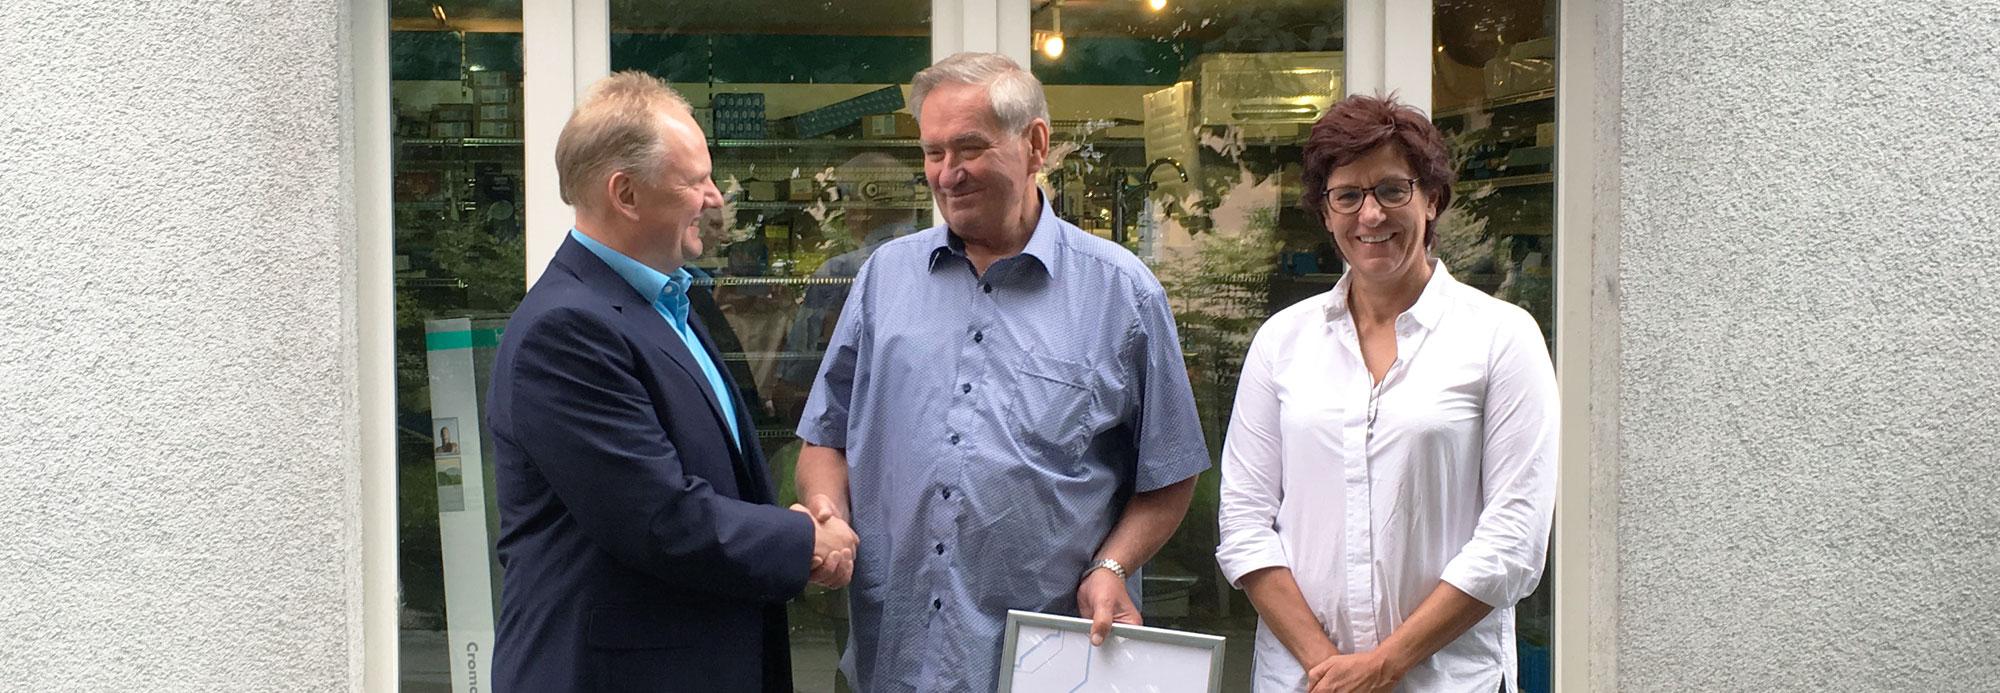 Bernd Neisser feiert sein 50-jähriges Arbeitsjubiläum